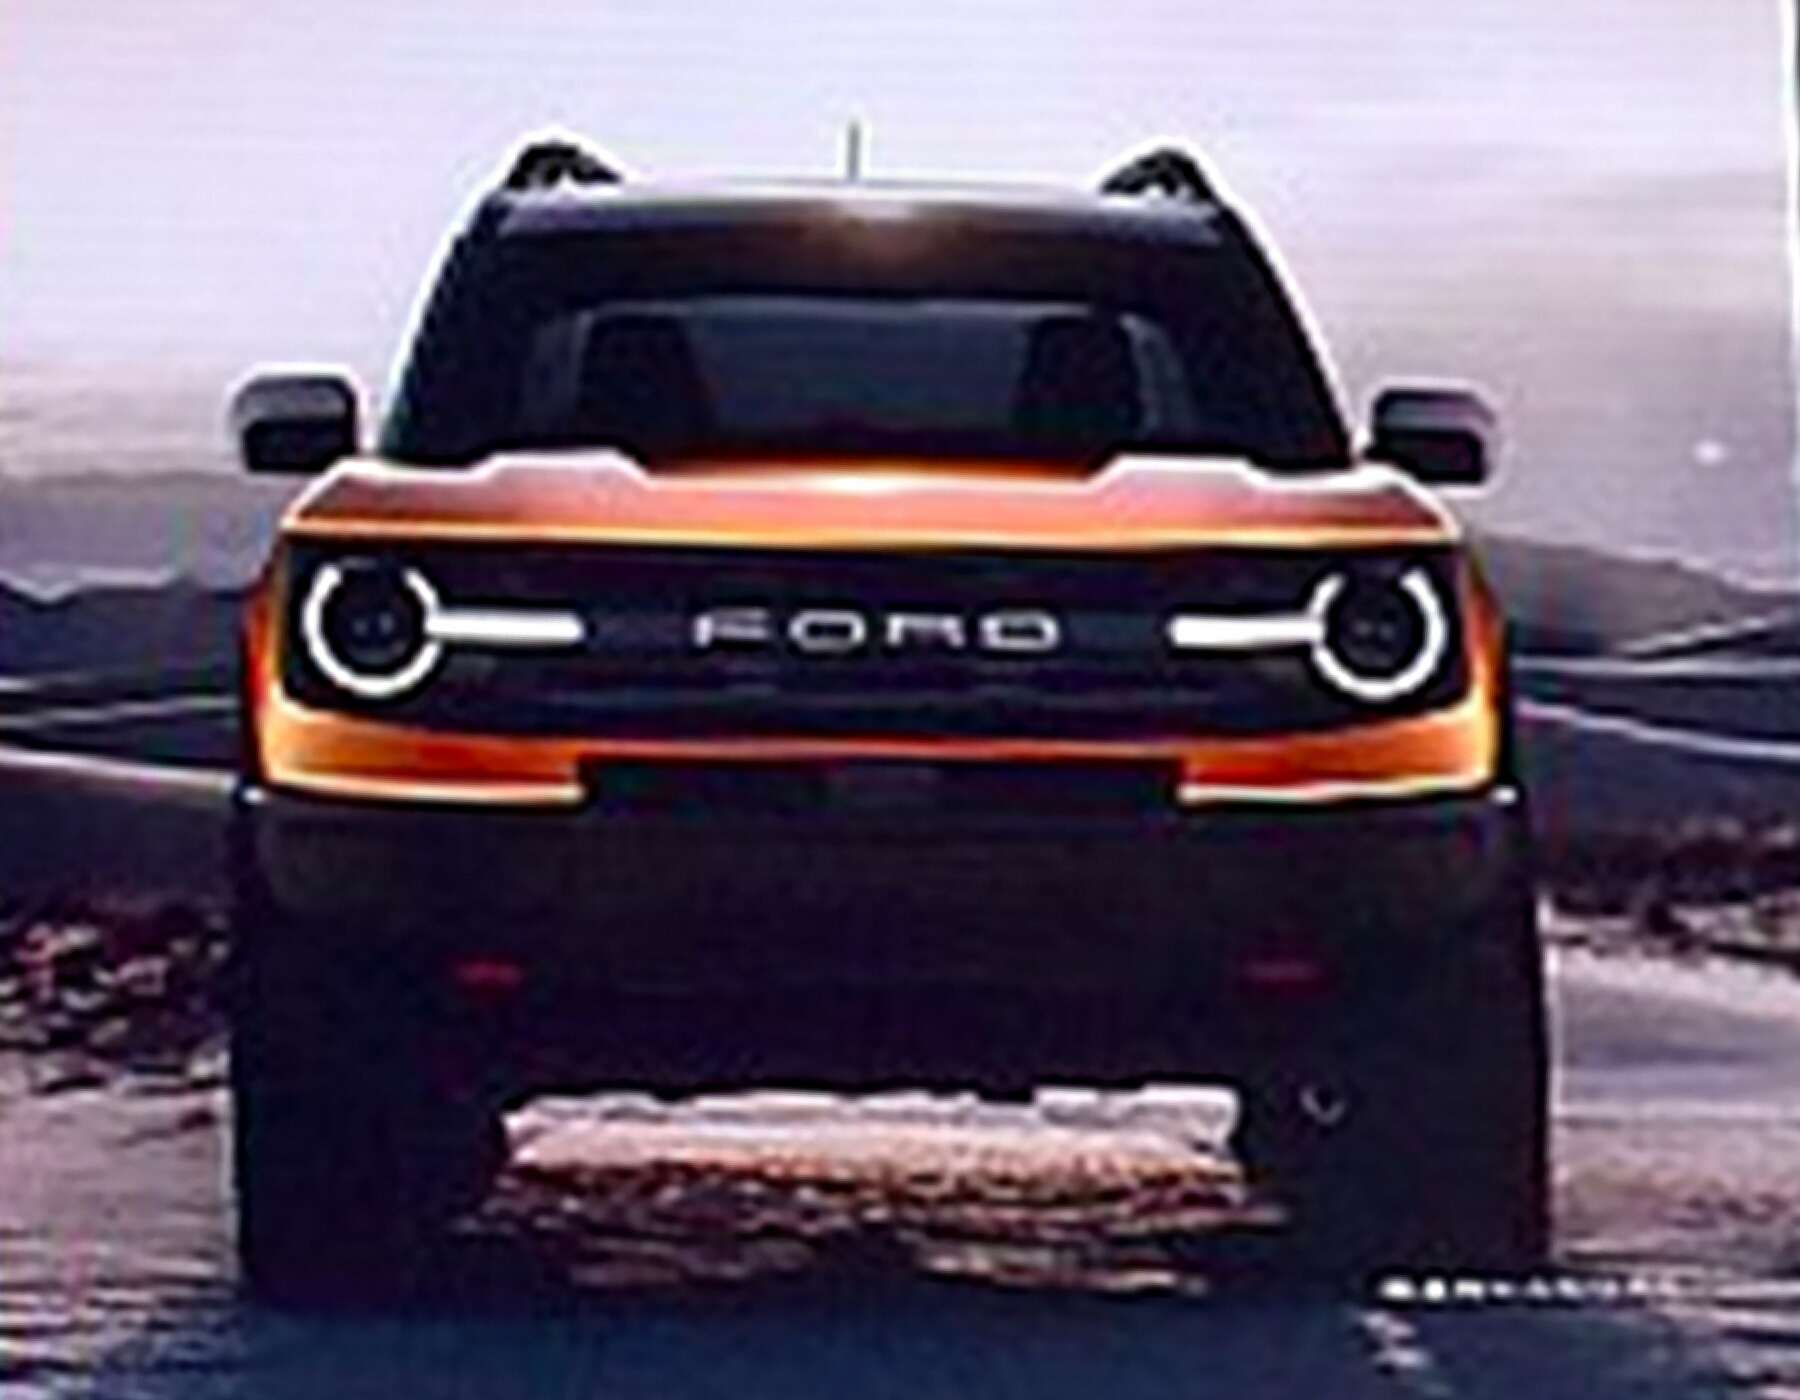 Ford autoguide